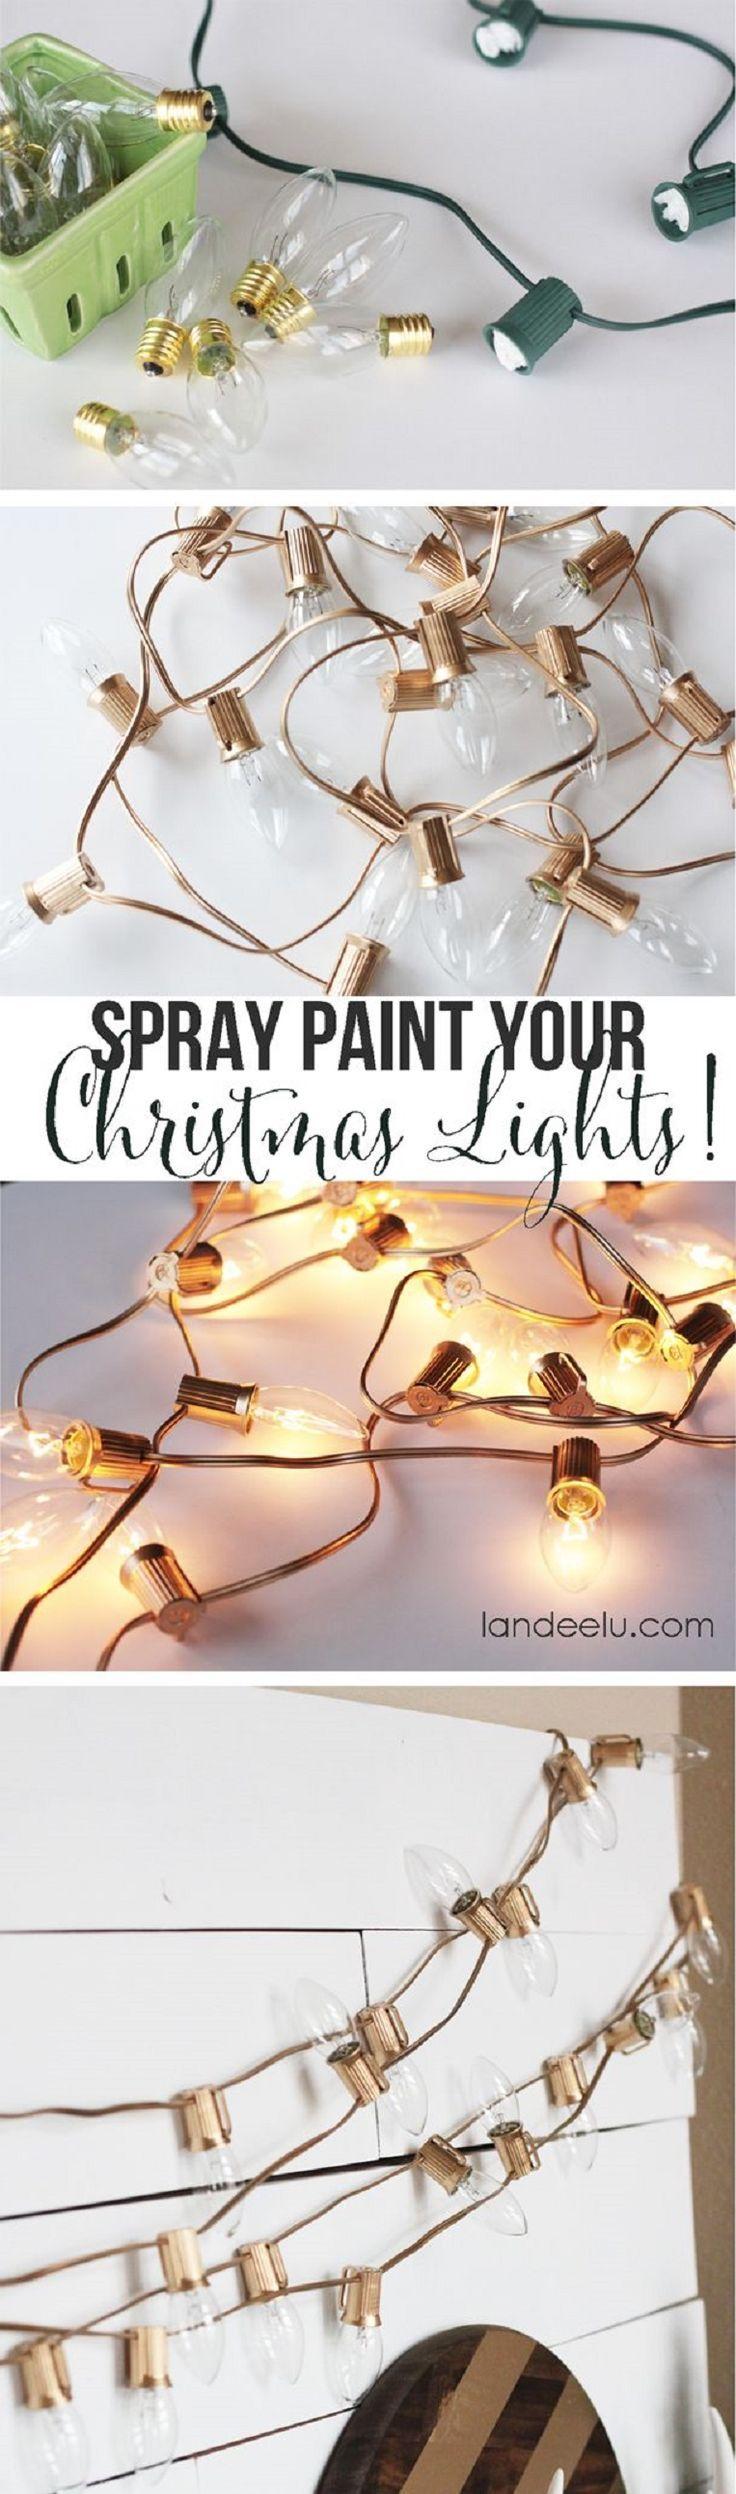 Best 25+ Christmas string lights ideas on Pinterest   String ...